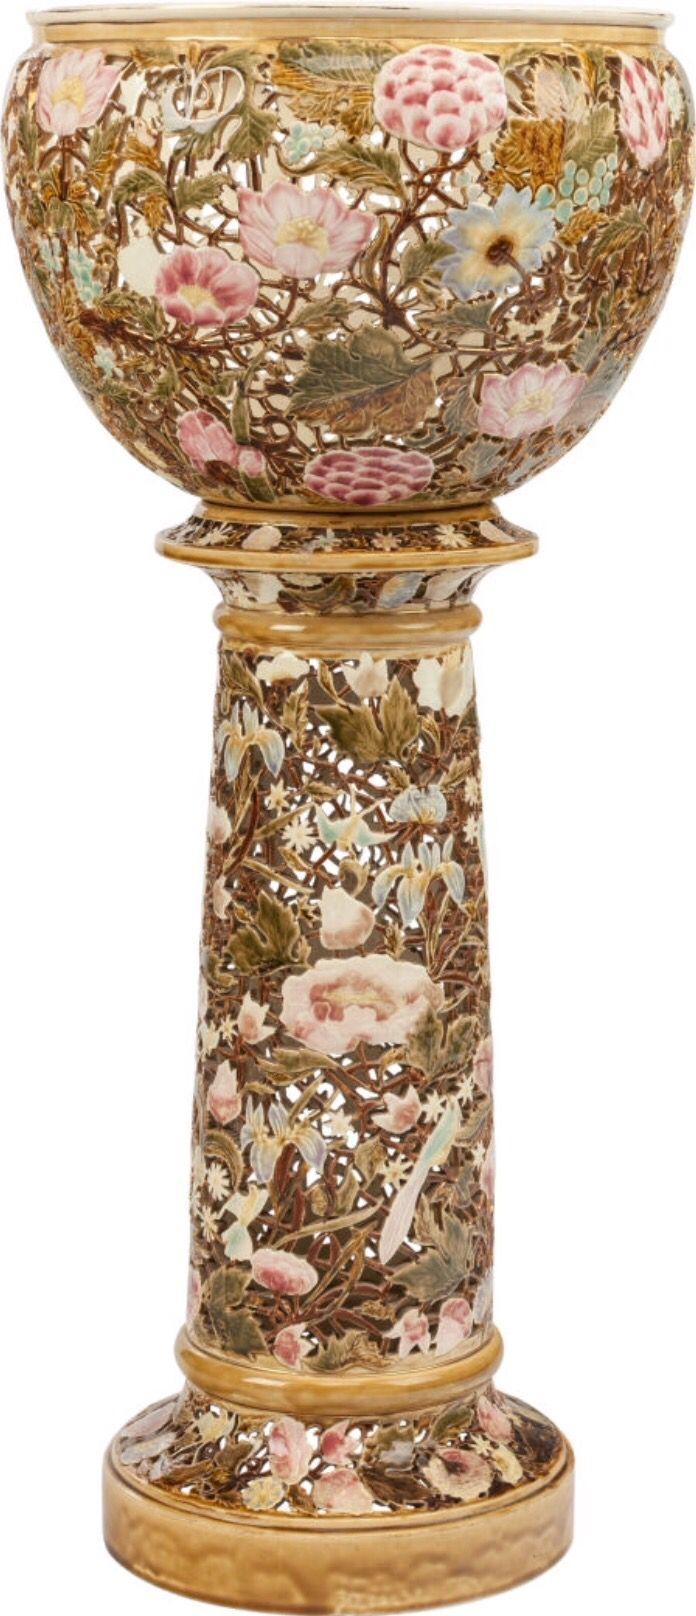 Majolica Grape Motif design w decorative Greek Key Border ~ 105 lbs Packed Antique Unpainted footed cement Urn Jardiniere Pedestal Planter